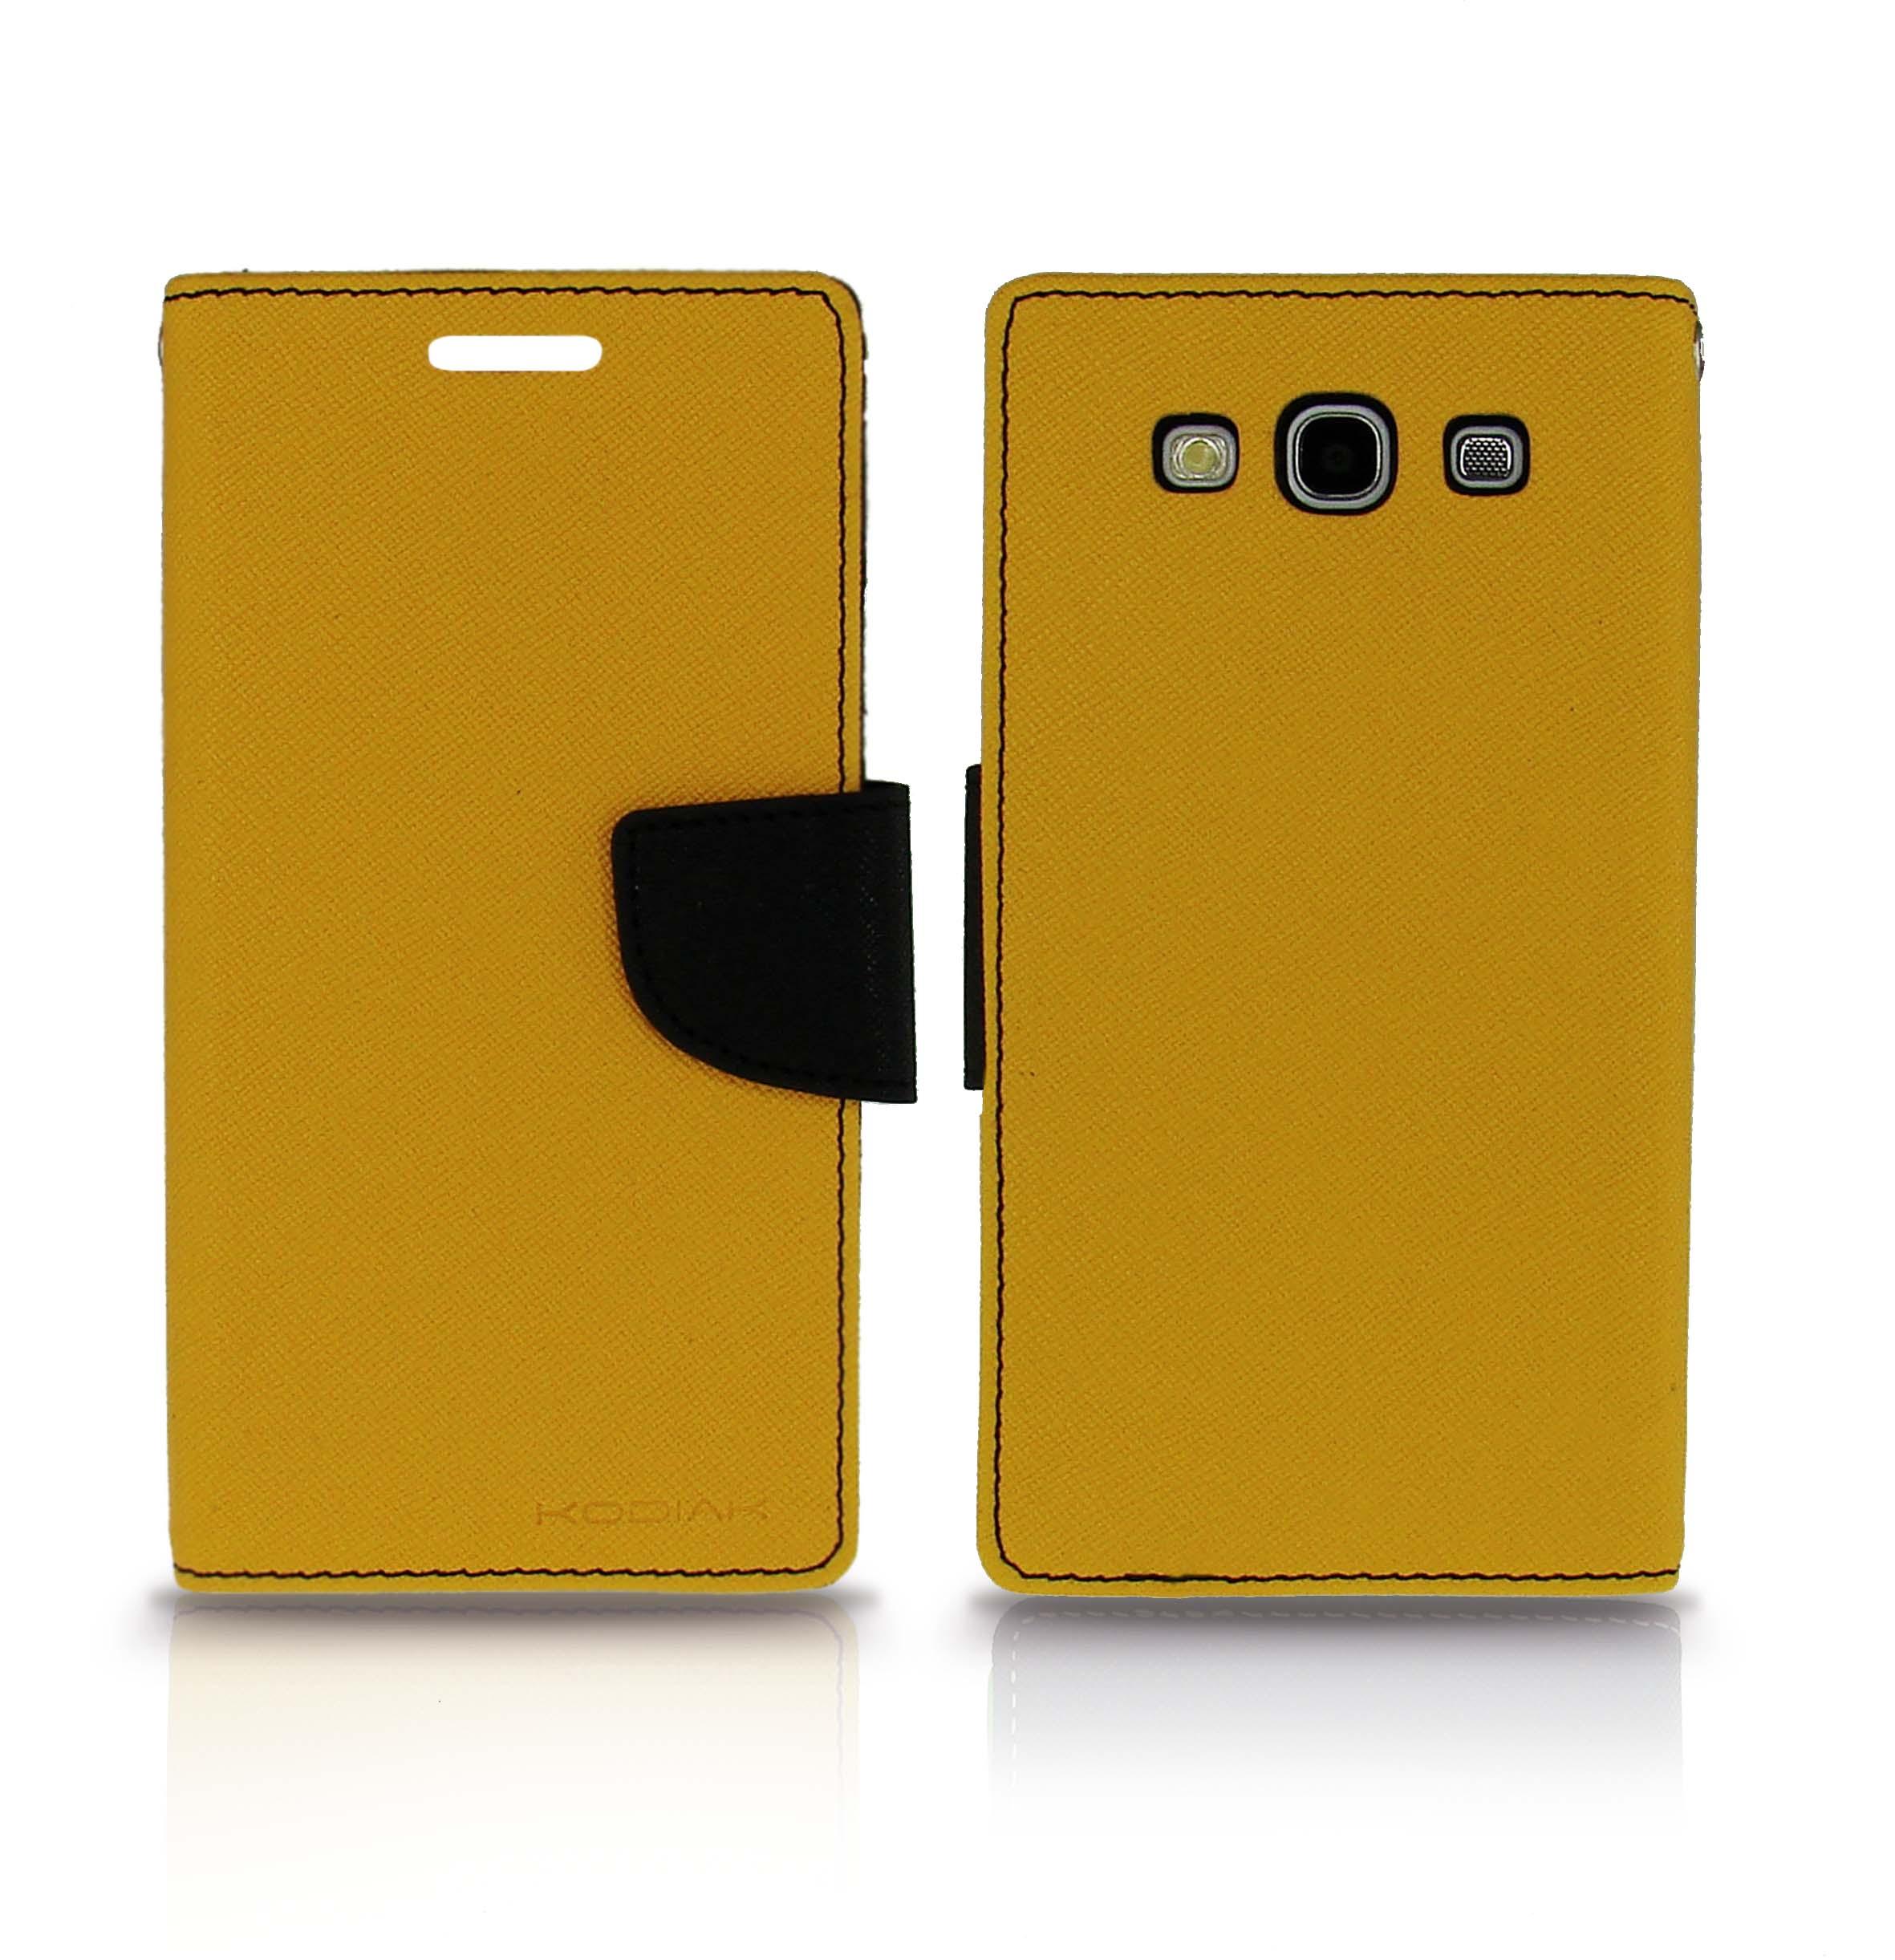 original-kodiak-flip-case-s3-wallet-id-yellow-black-retail